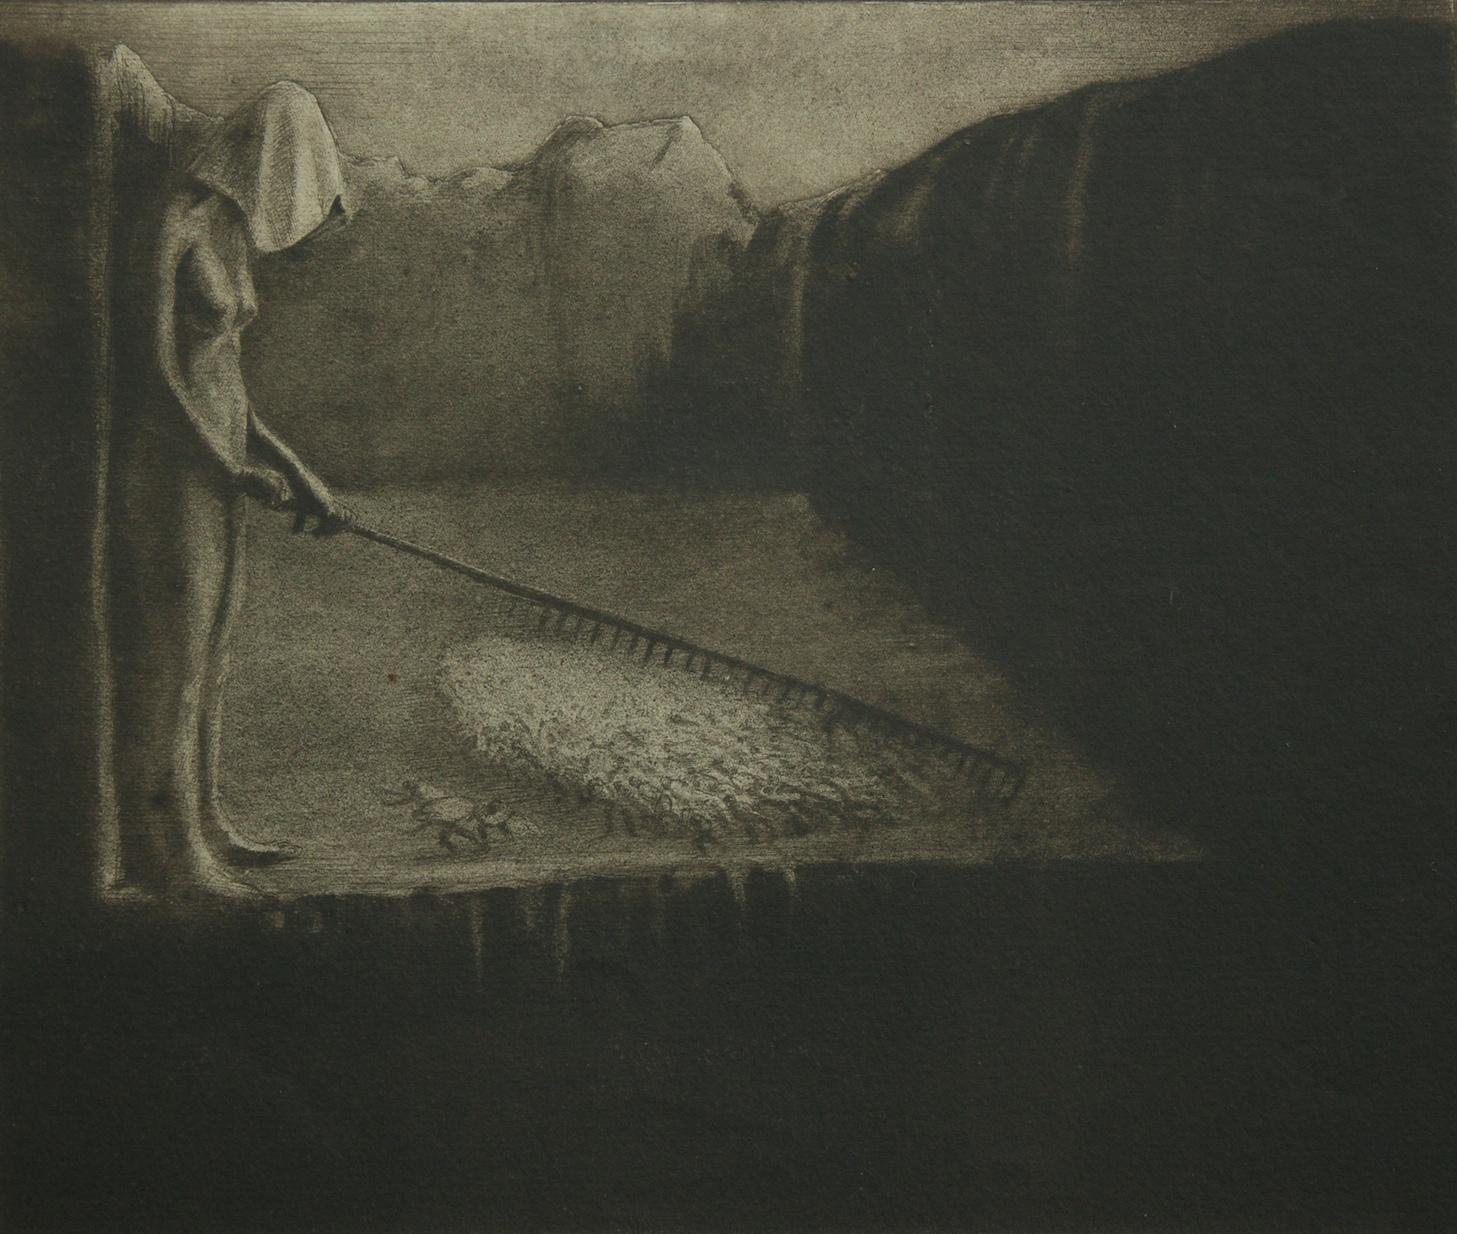 Alfred Kubin - Das Menschenschicksal (The human fate) - Collagraphy - 1903